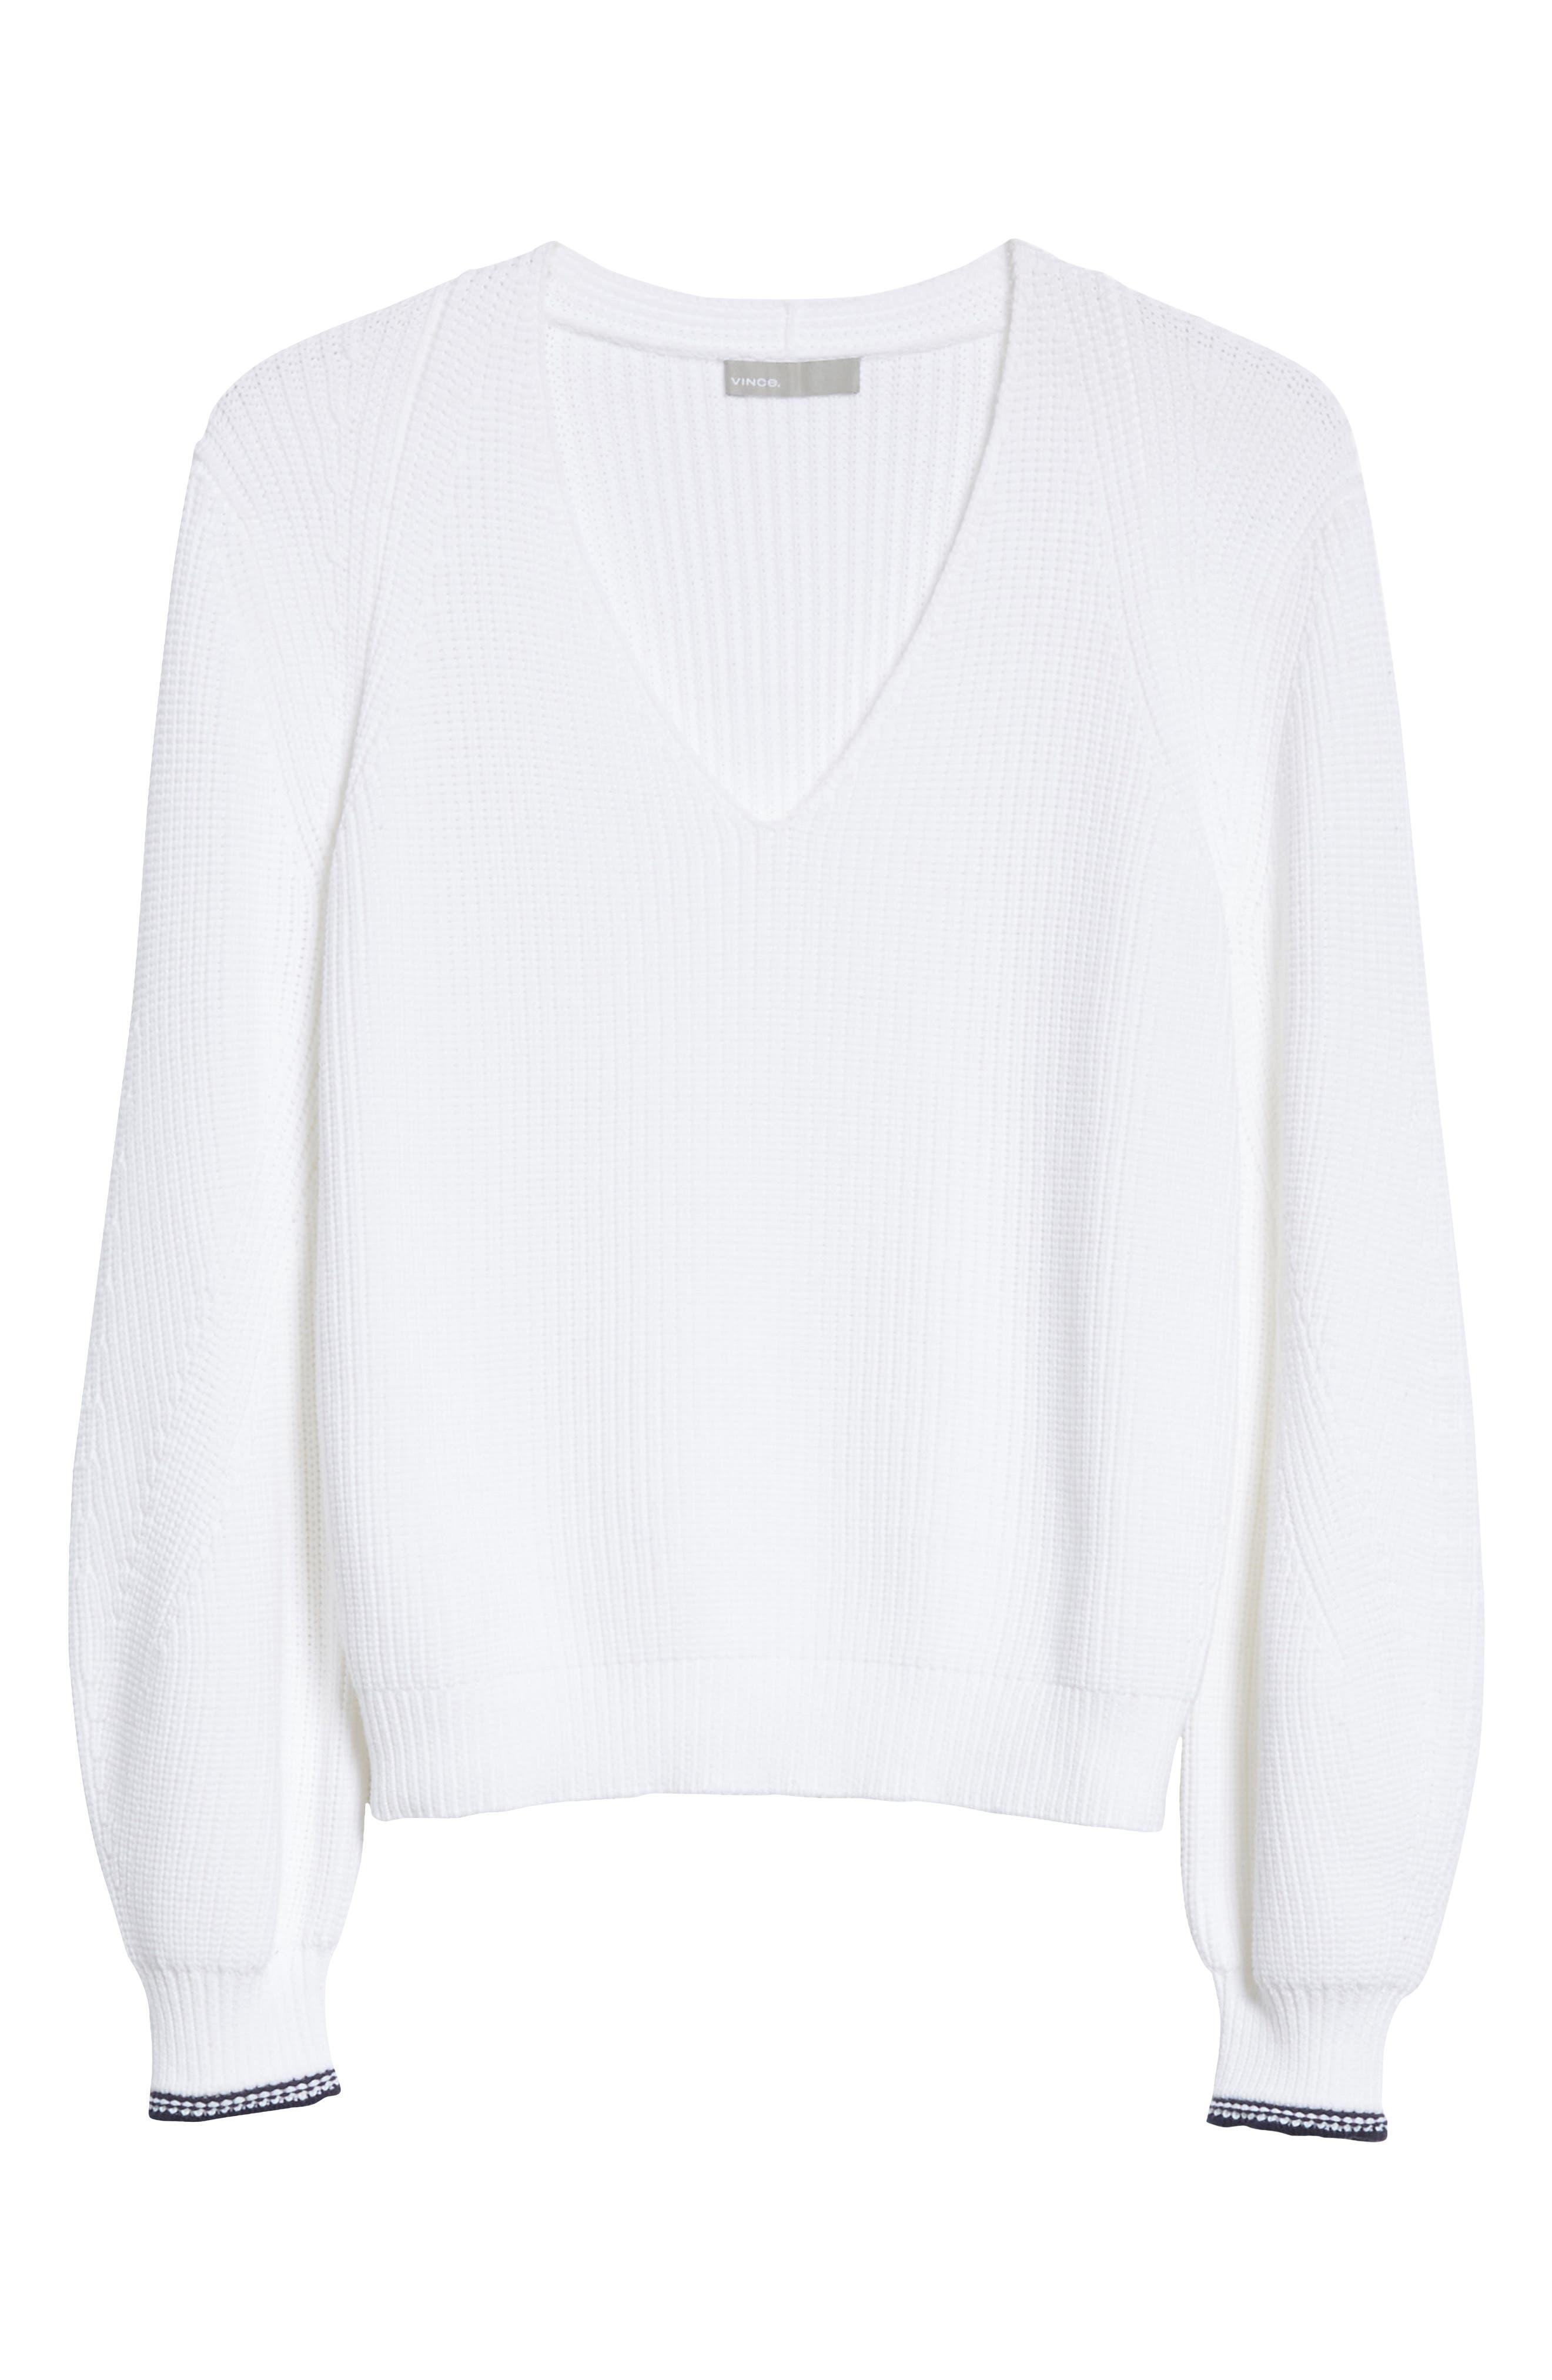 Bishop Sleeve Sweater,                             Alternate thumbnail 6, color,                             Optic White/ Coastal